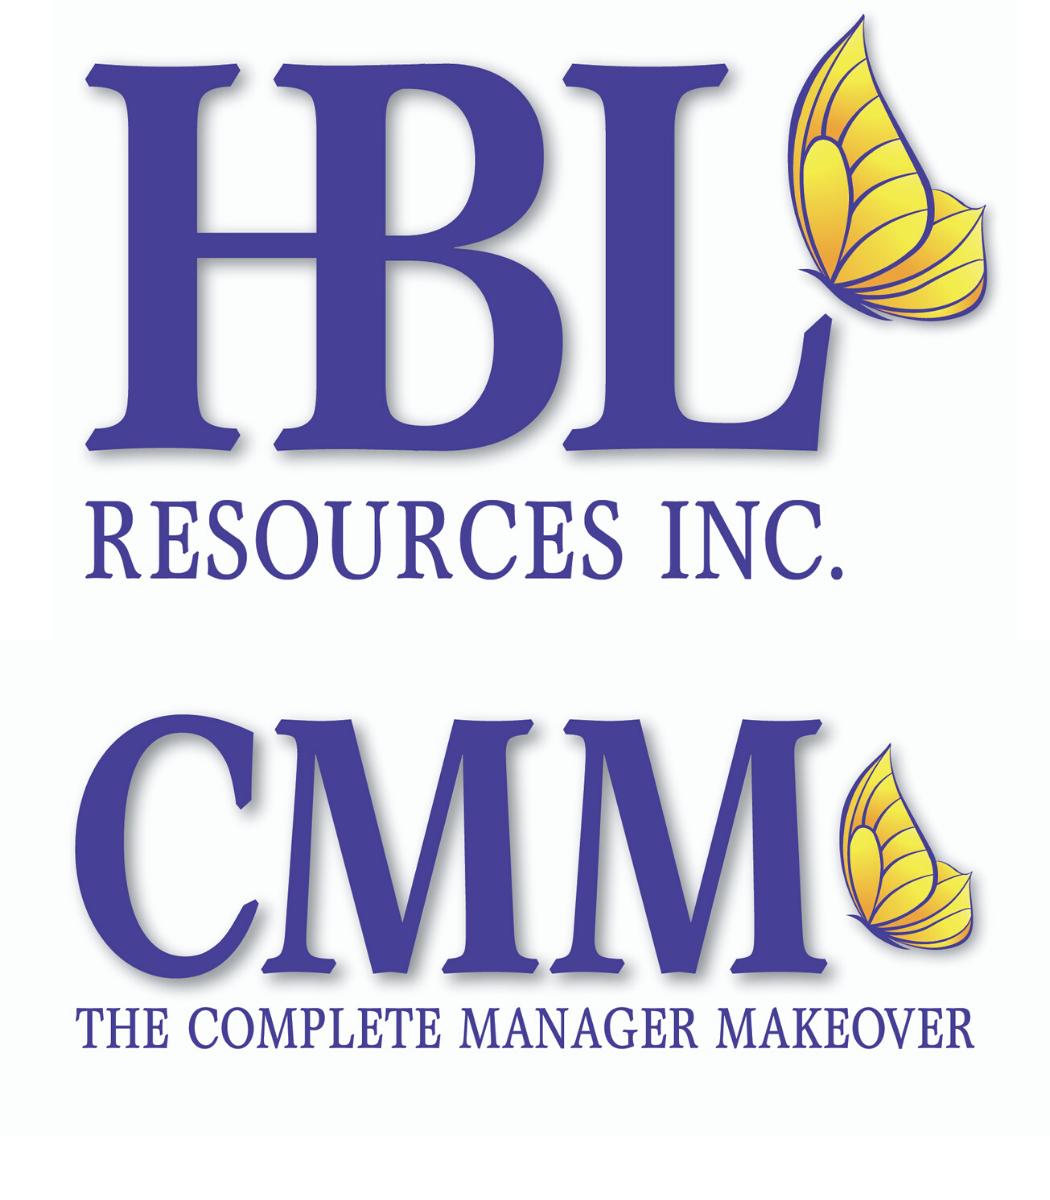 HBL Resources Inc.